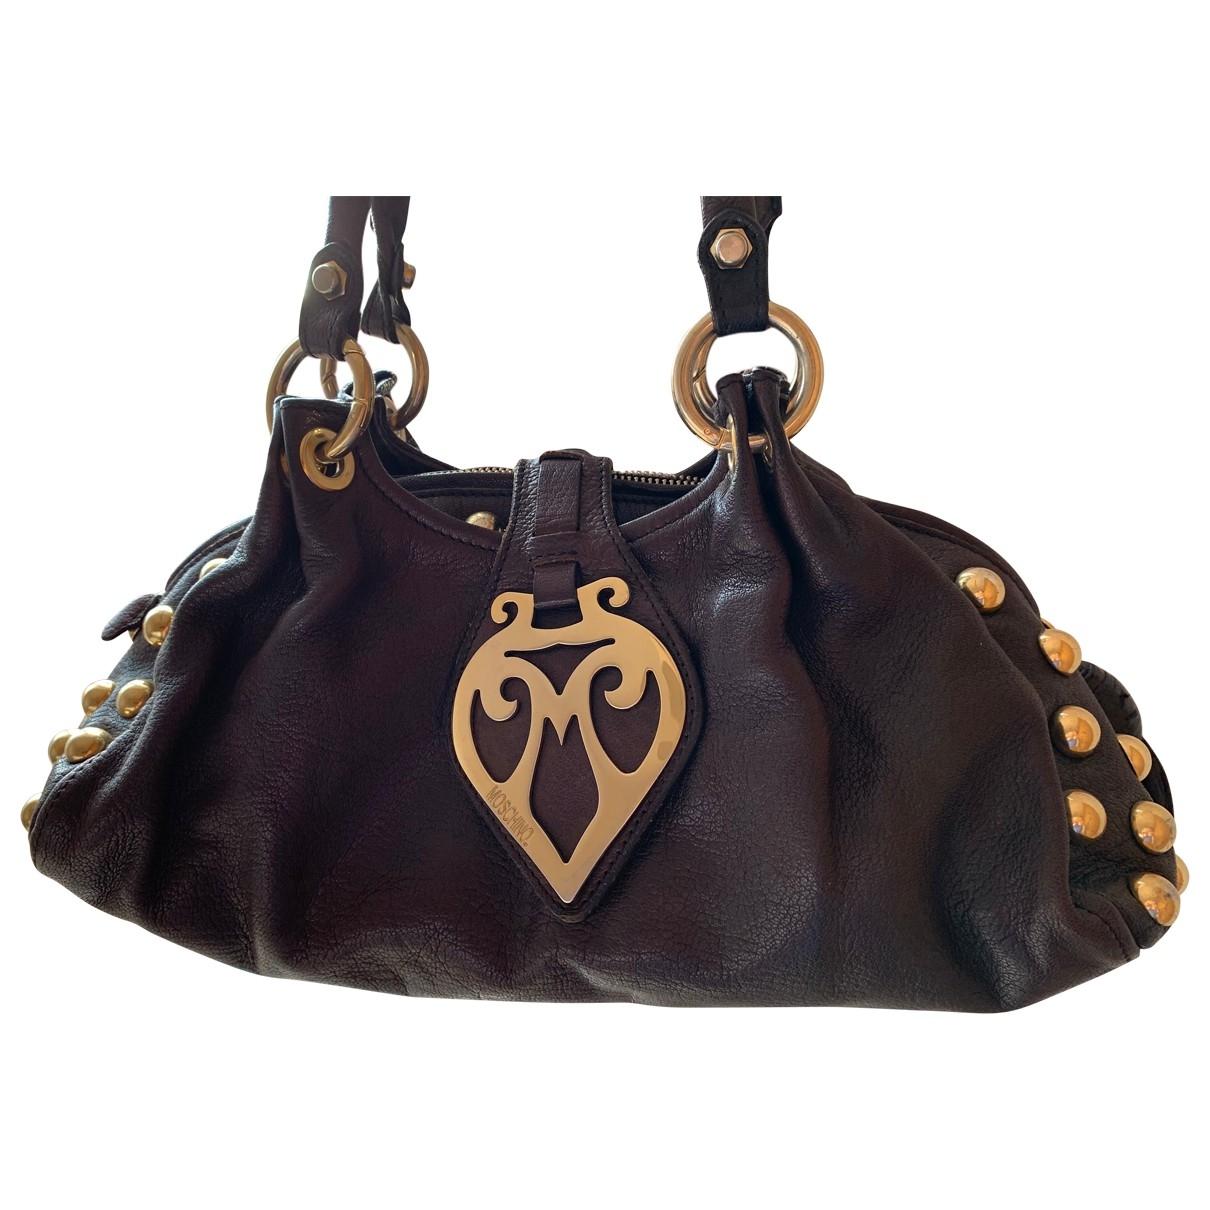 Moschino \N Brown Leather handbag for Women \N